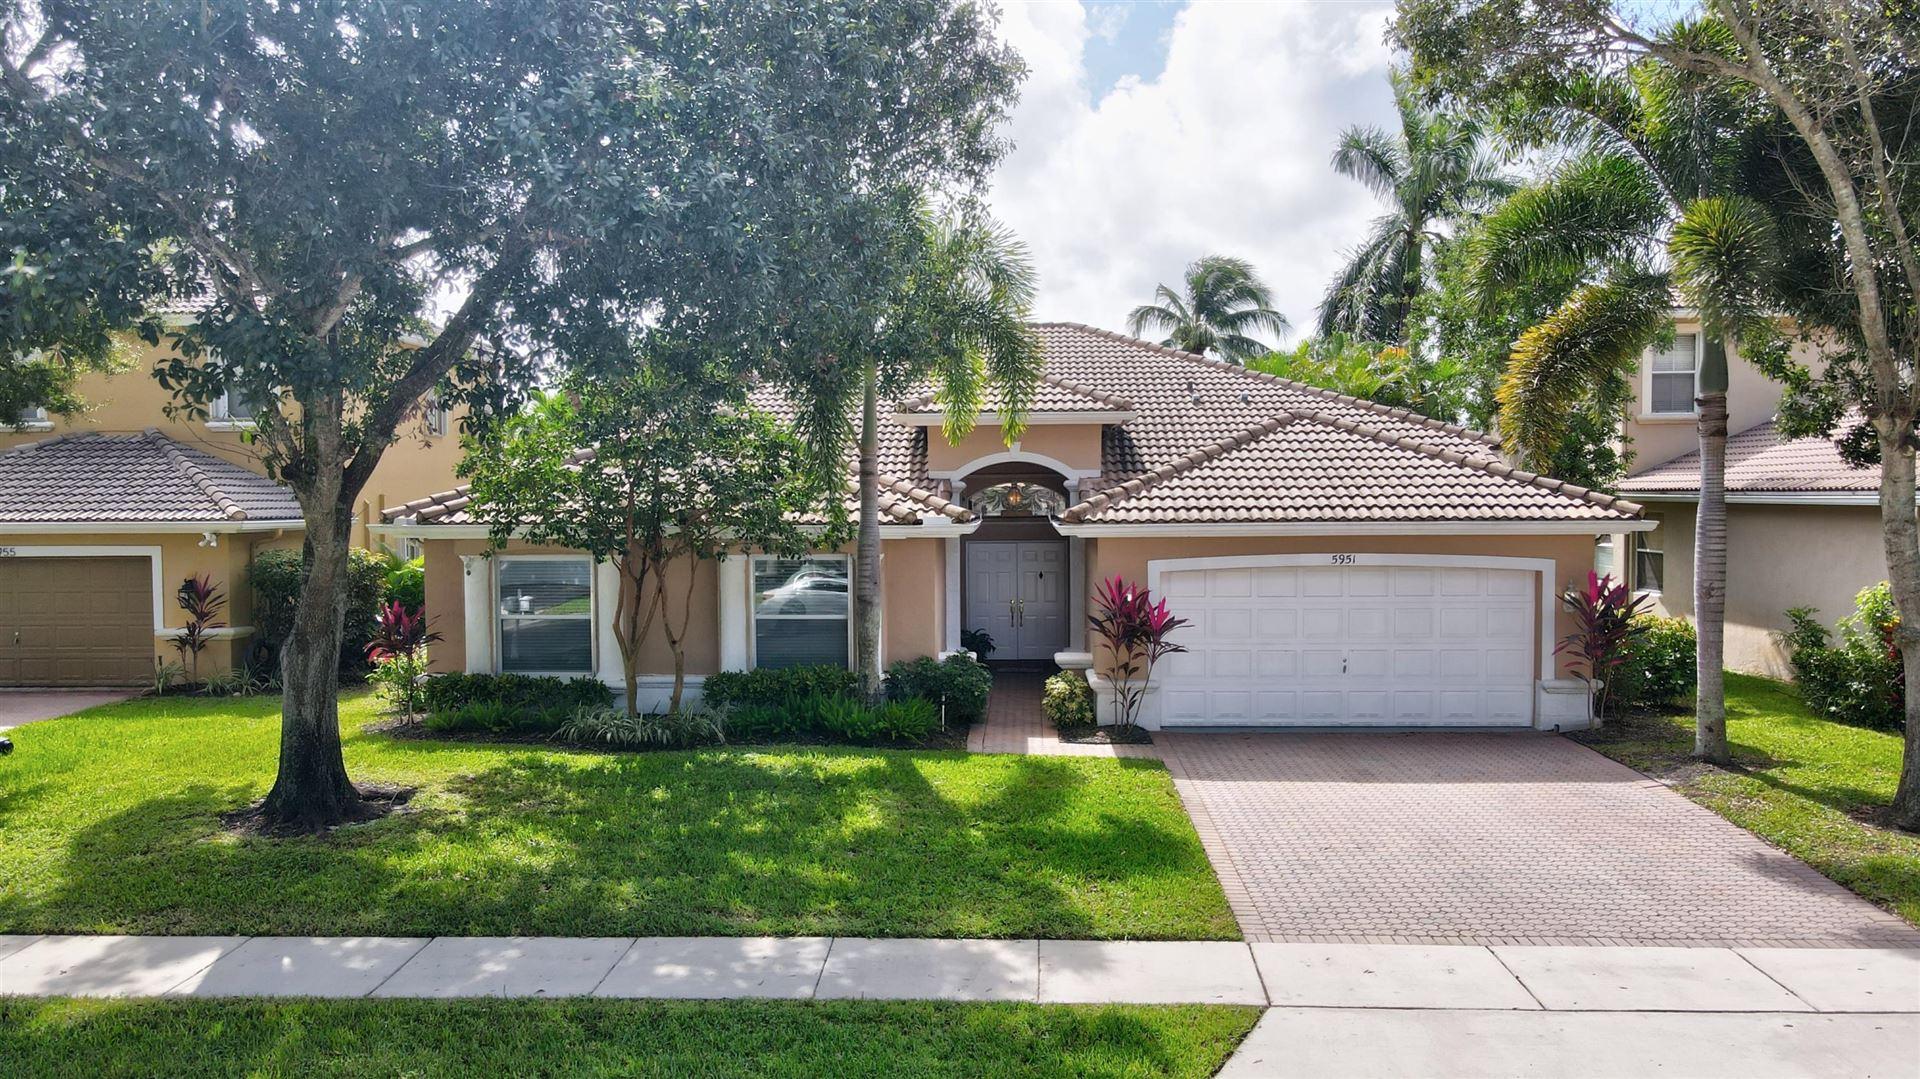 Photo of 5951 Bay Hill Circle, Lake Worth, FL 33463 (MLS # RX-10667077)